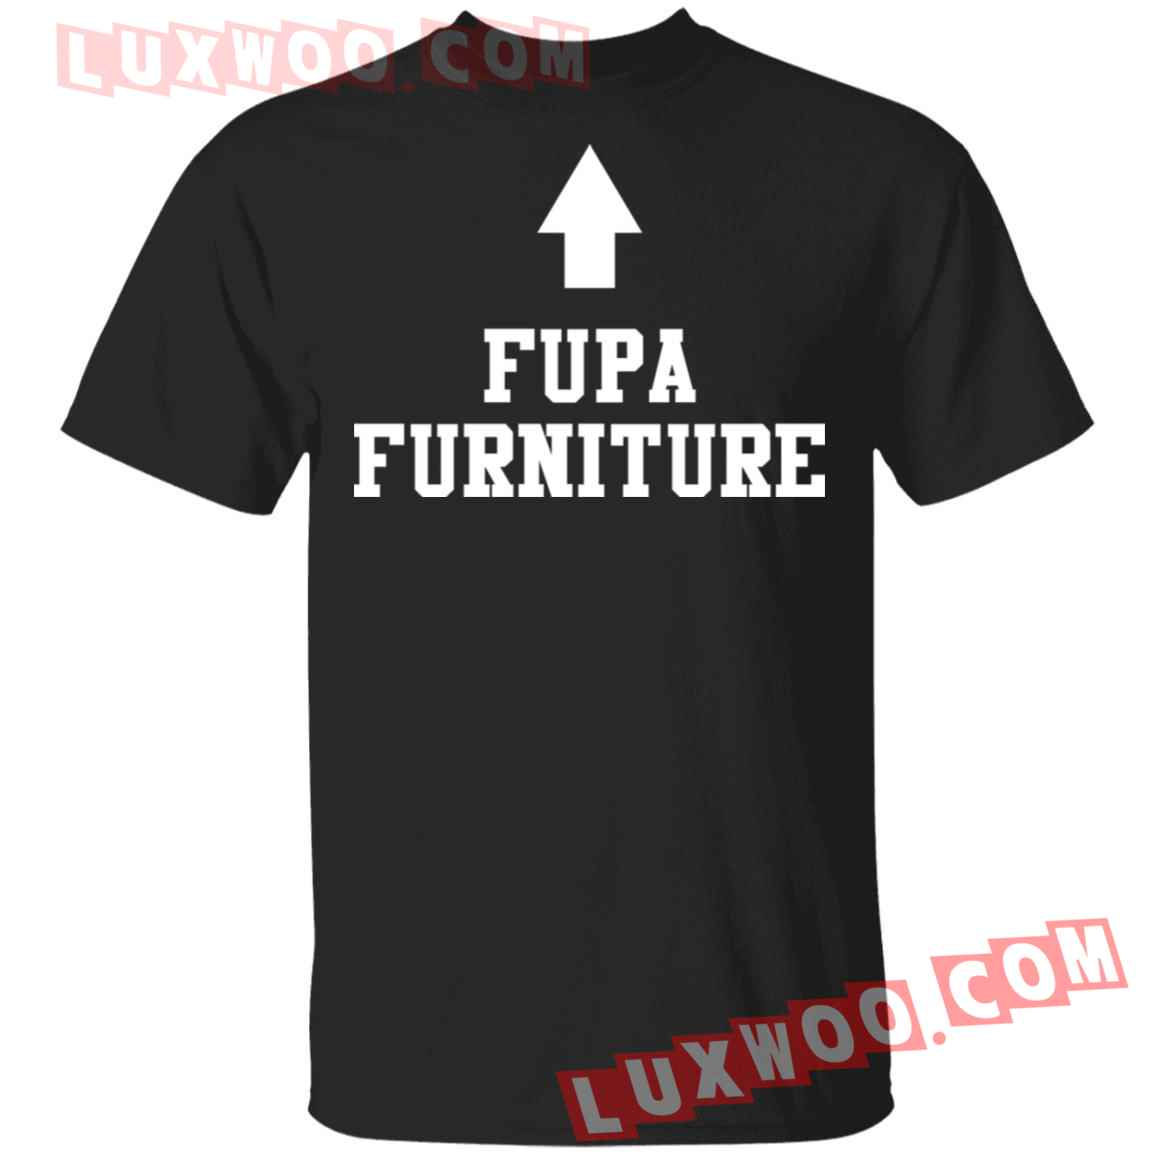 Fupa Furniture Shirt